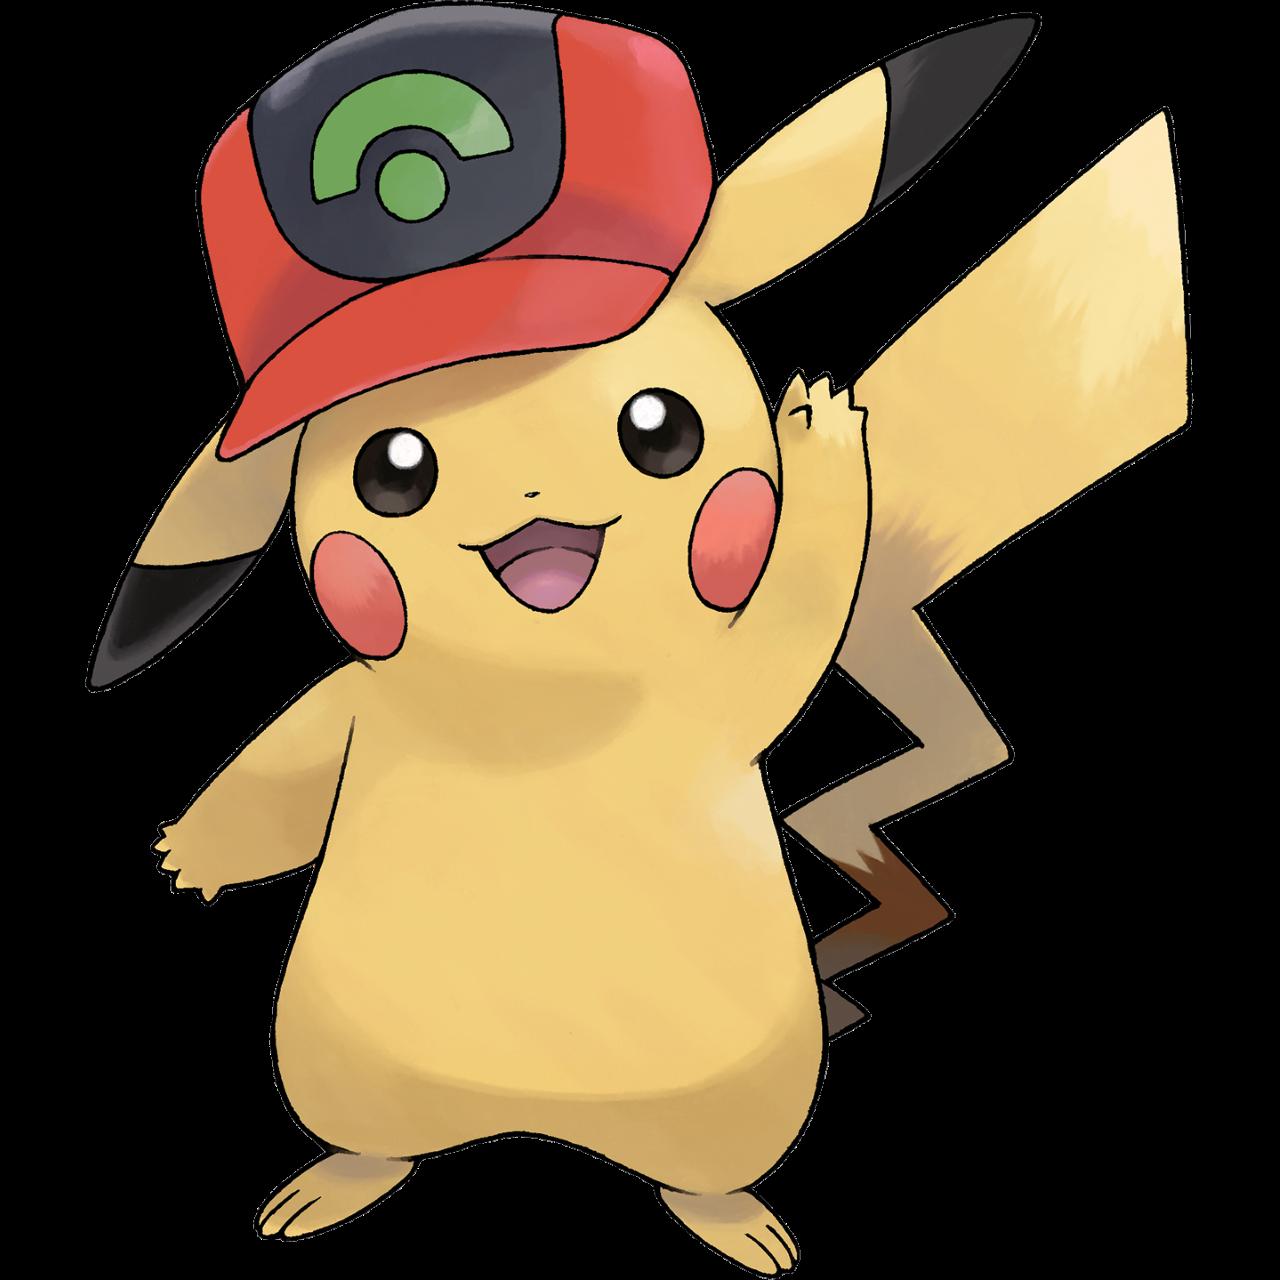 Sun spikes clipart clip art library Ash's Pikachu - Bulbapedia, the community-driven Pokémon ... clip art library